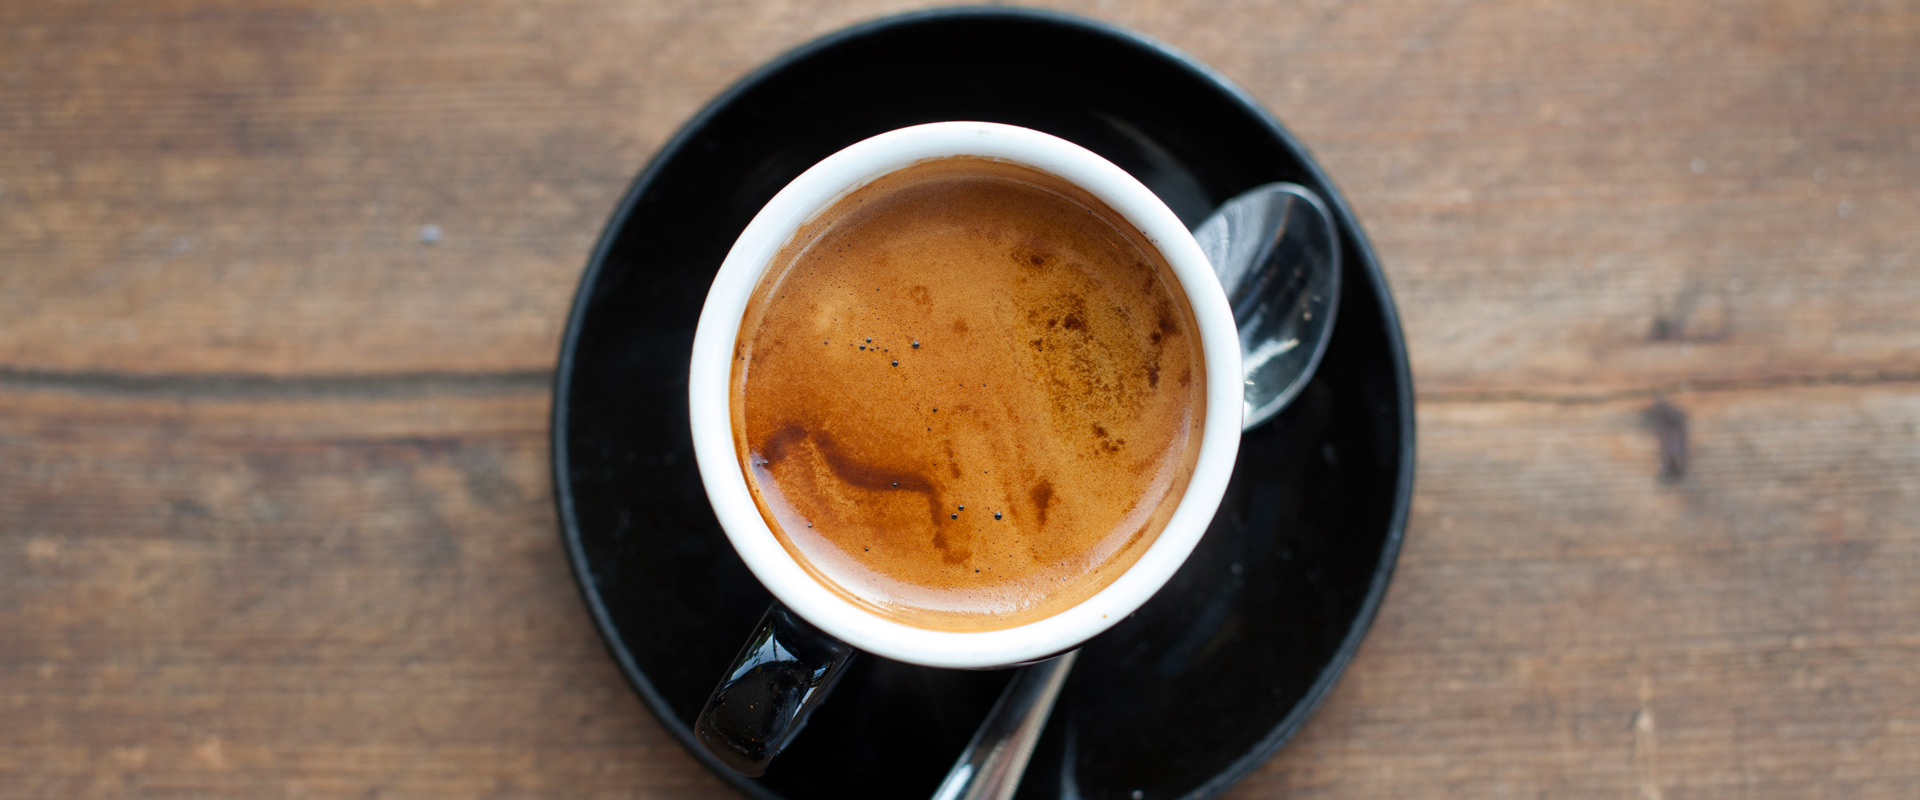 koffeinkávé